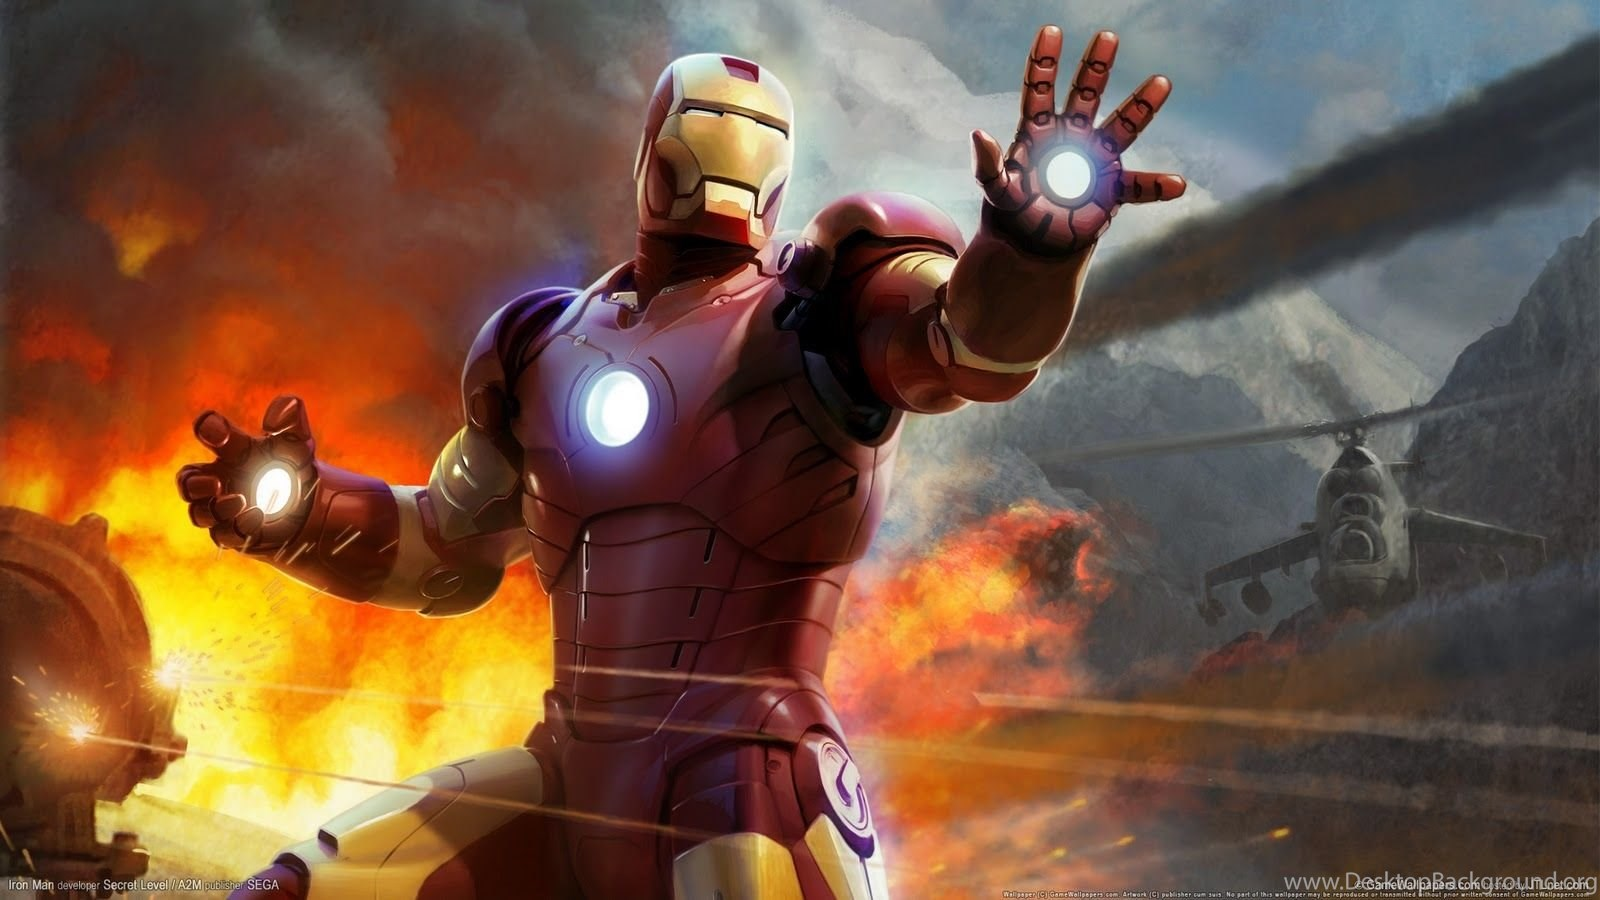 Iron Man 3 Wallpaper Iron Man 3 Wallpapers Desktop Background